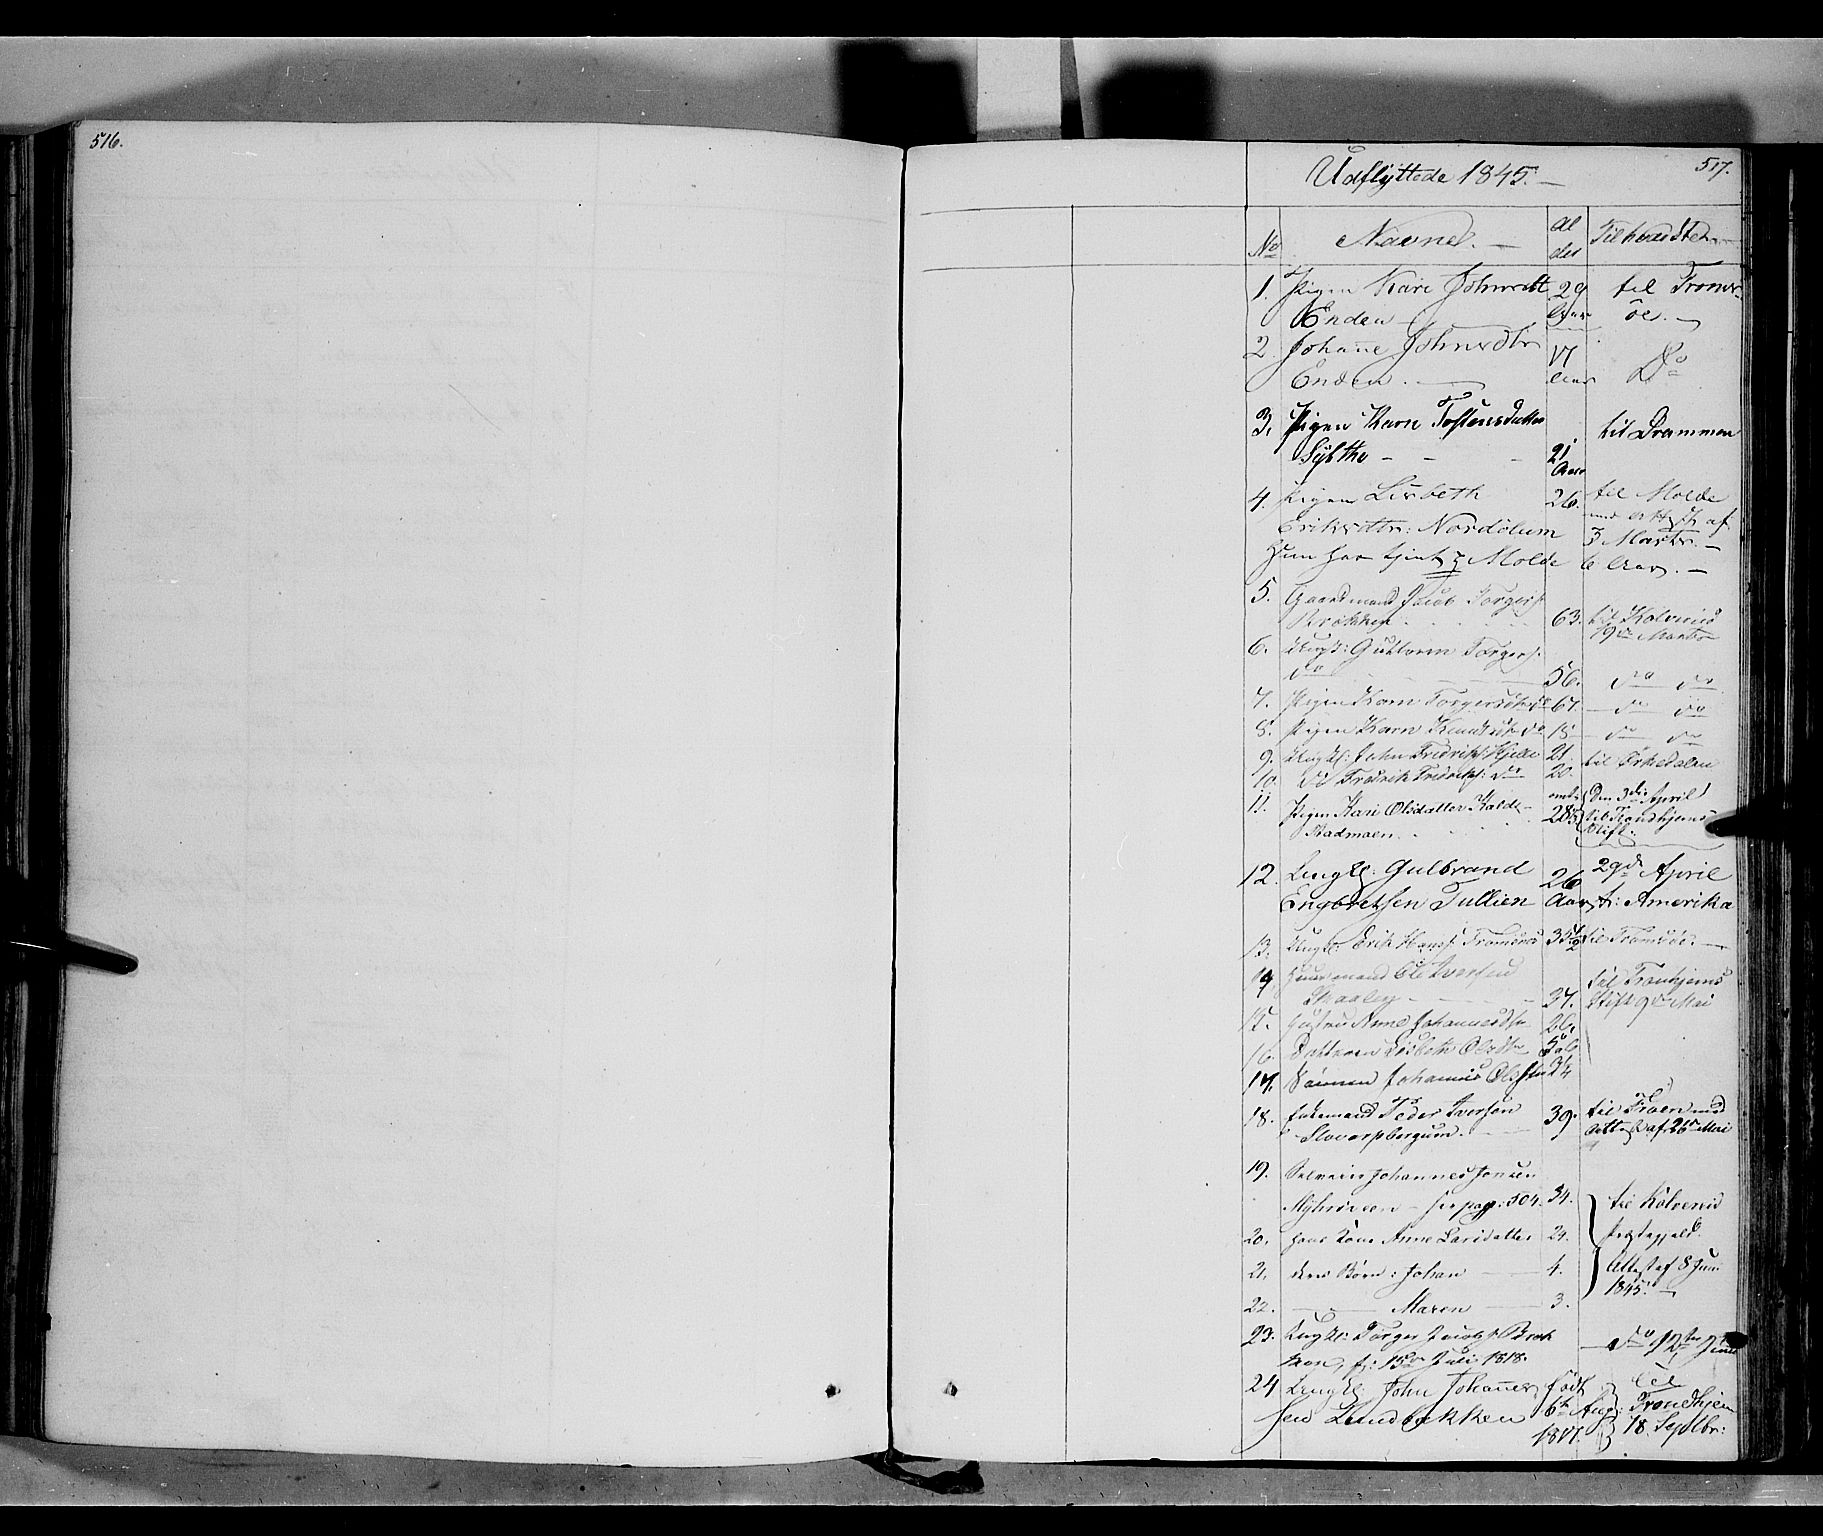 SAH, Ringebu prestekontor, Ministerialbok nr. 5, 1839-1848, s. 516-517